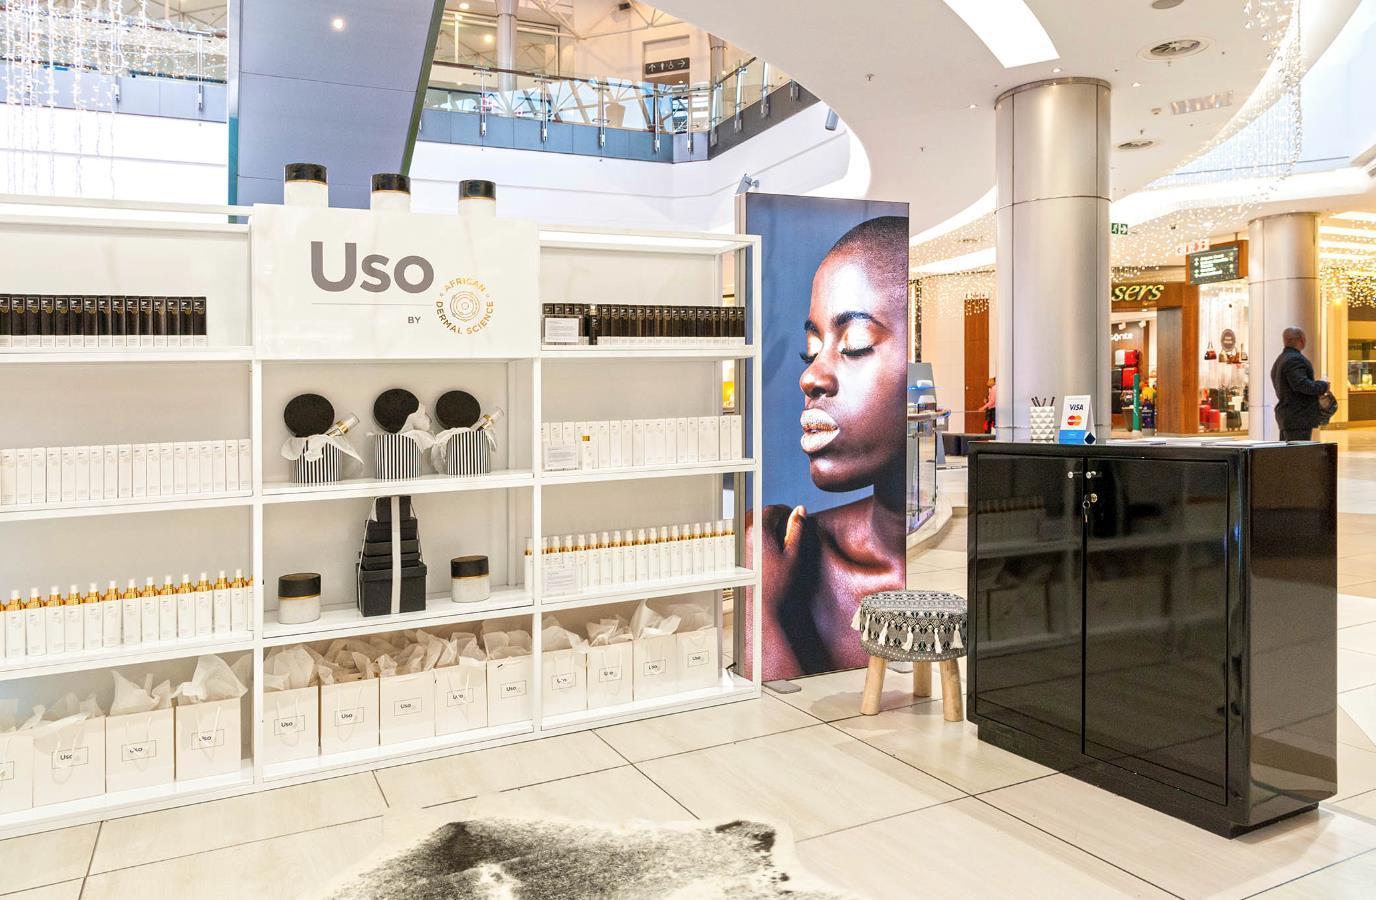 bespoke-retail-displays-for african-dermal-science-by-scanretail Science